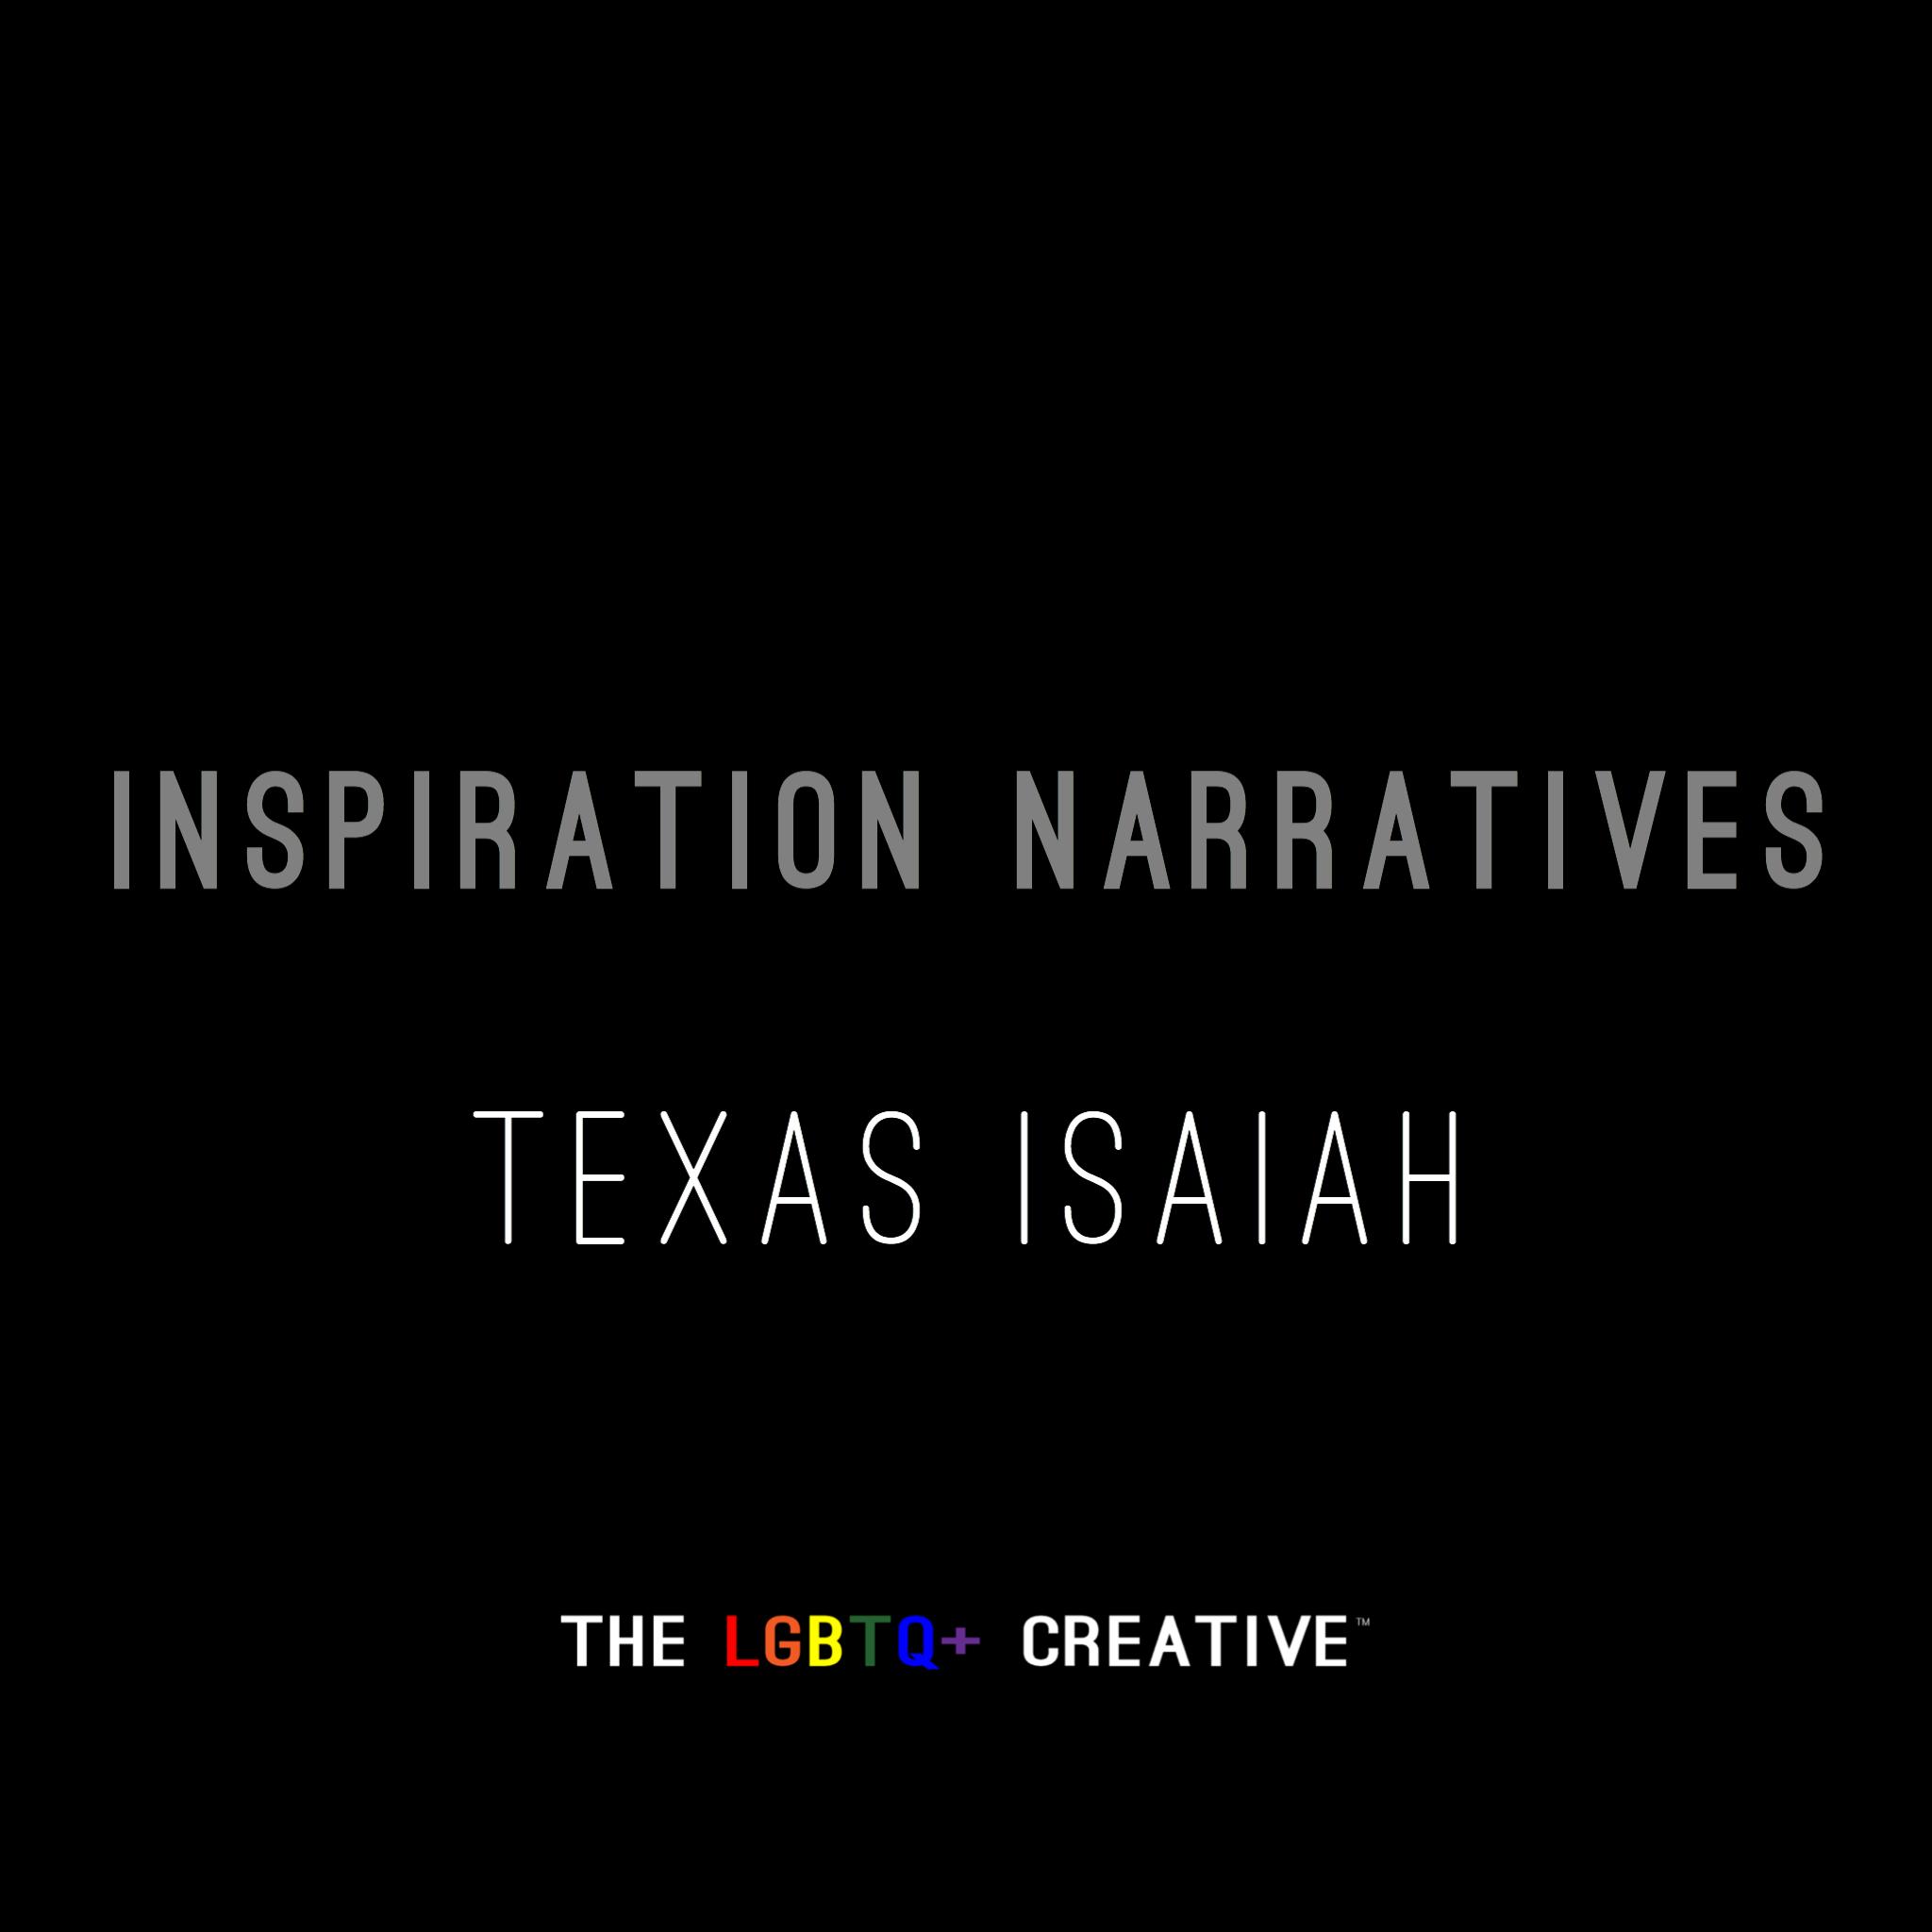 Inspiration Narratives - Texas Isaiah